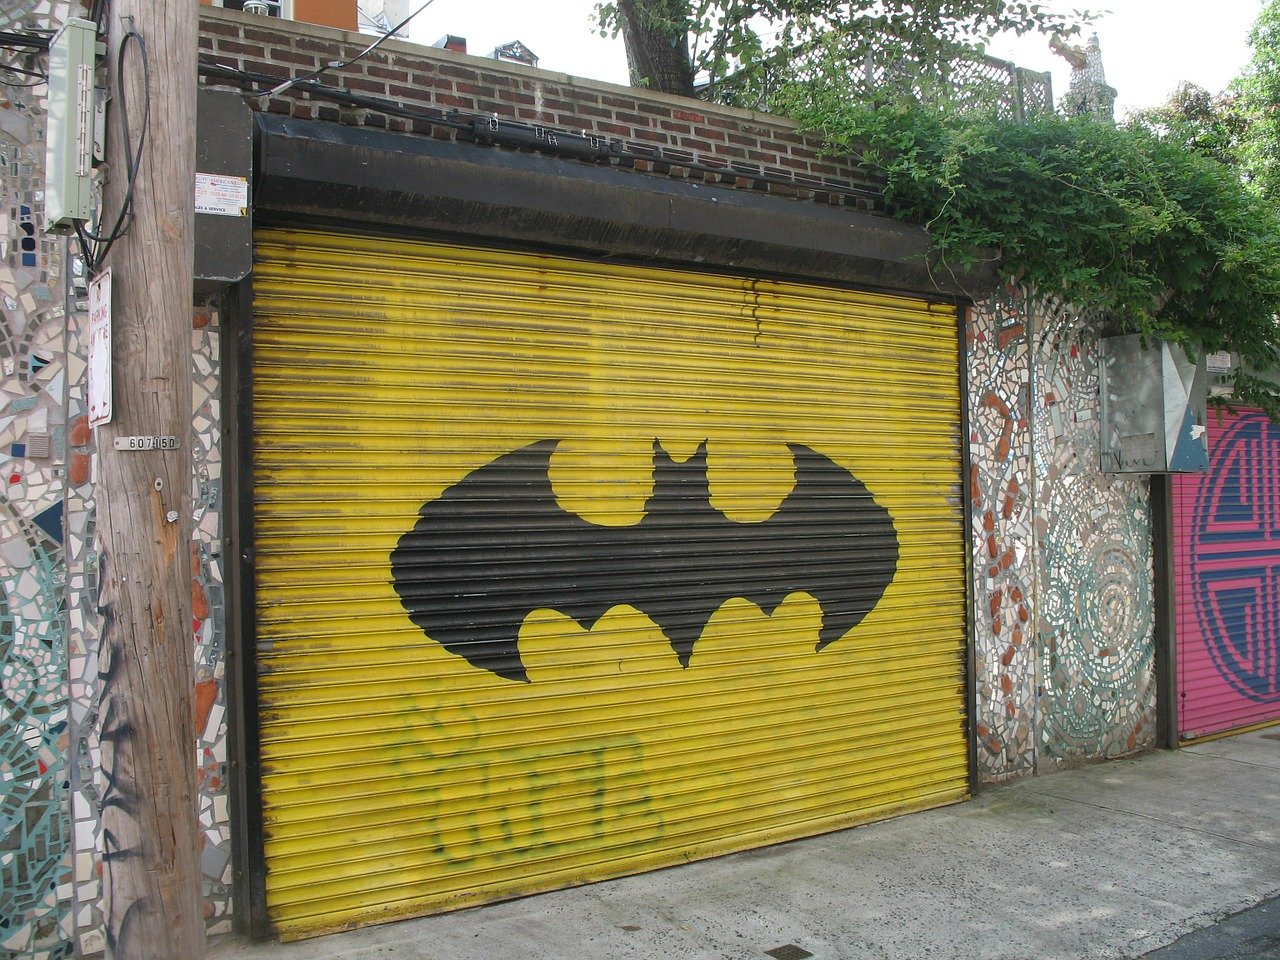 List Of The Most Interesting Batman Car Accessories